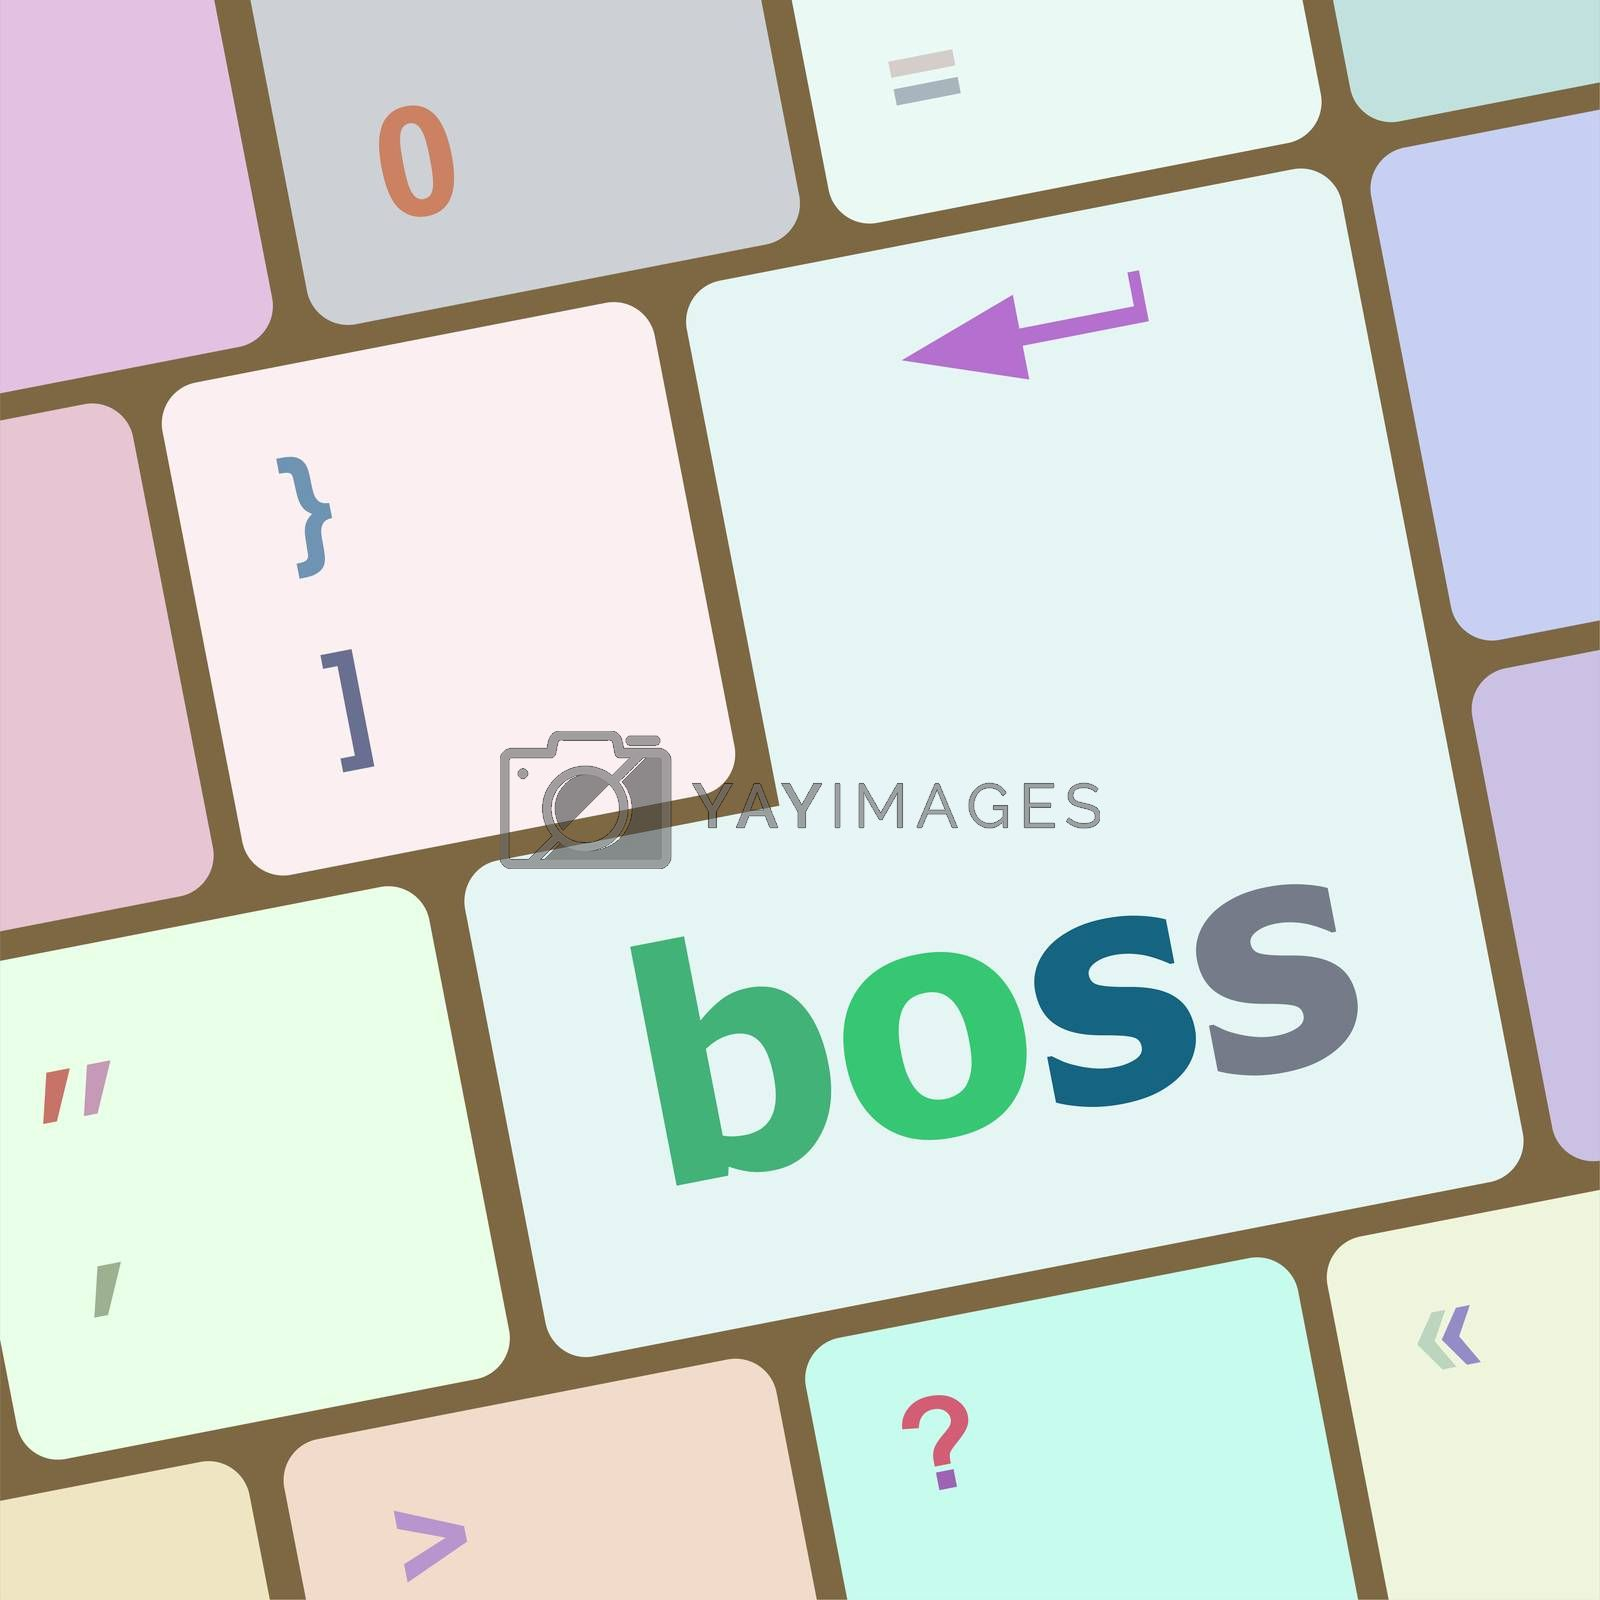 boss word on keyboard key, notebook computer button